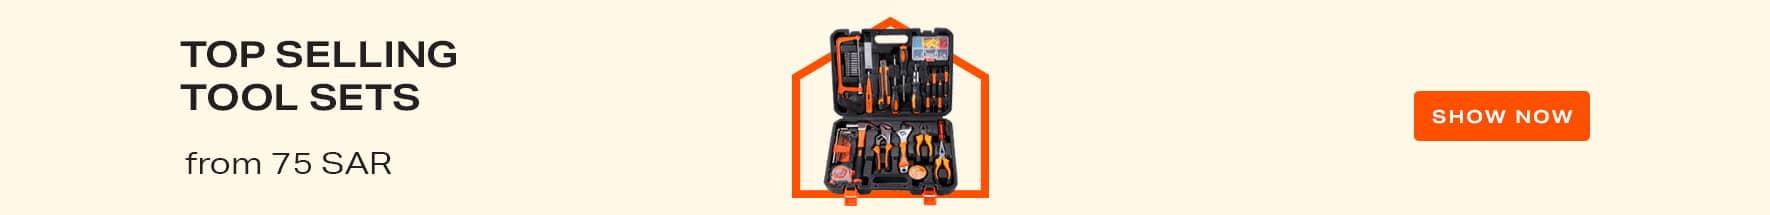 Top Selling Lawazim Tool Sets